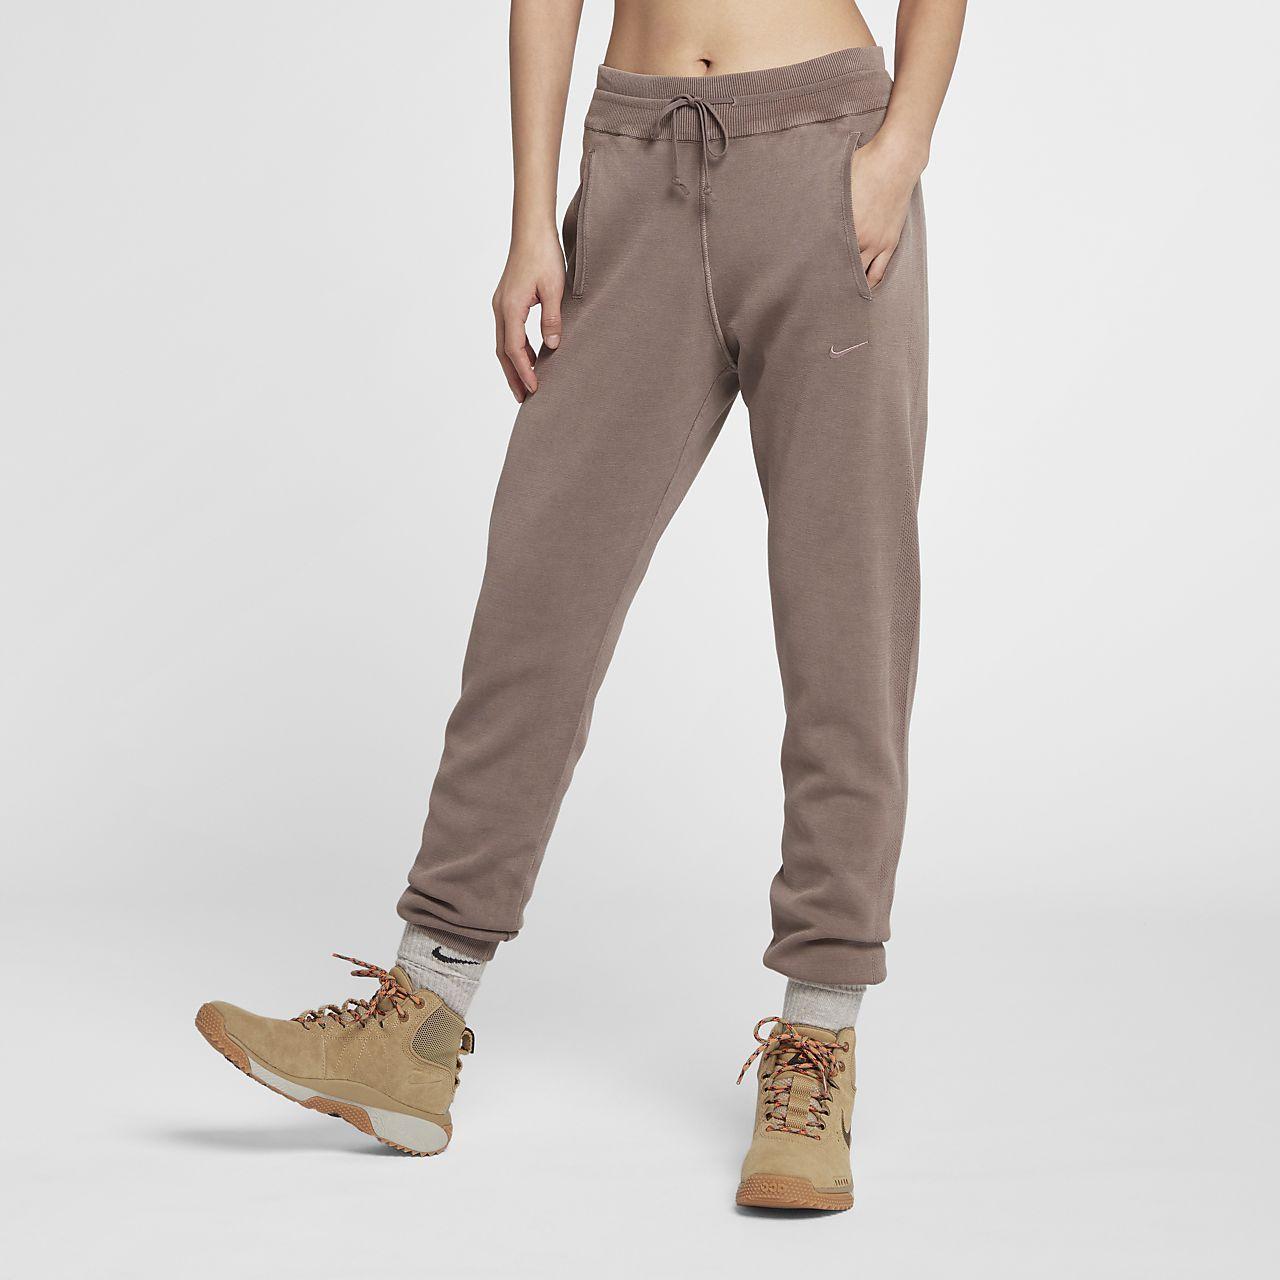 Calças de malha NikeLab Made in Italy Collection para mulher